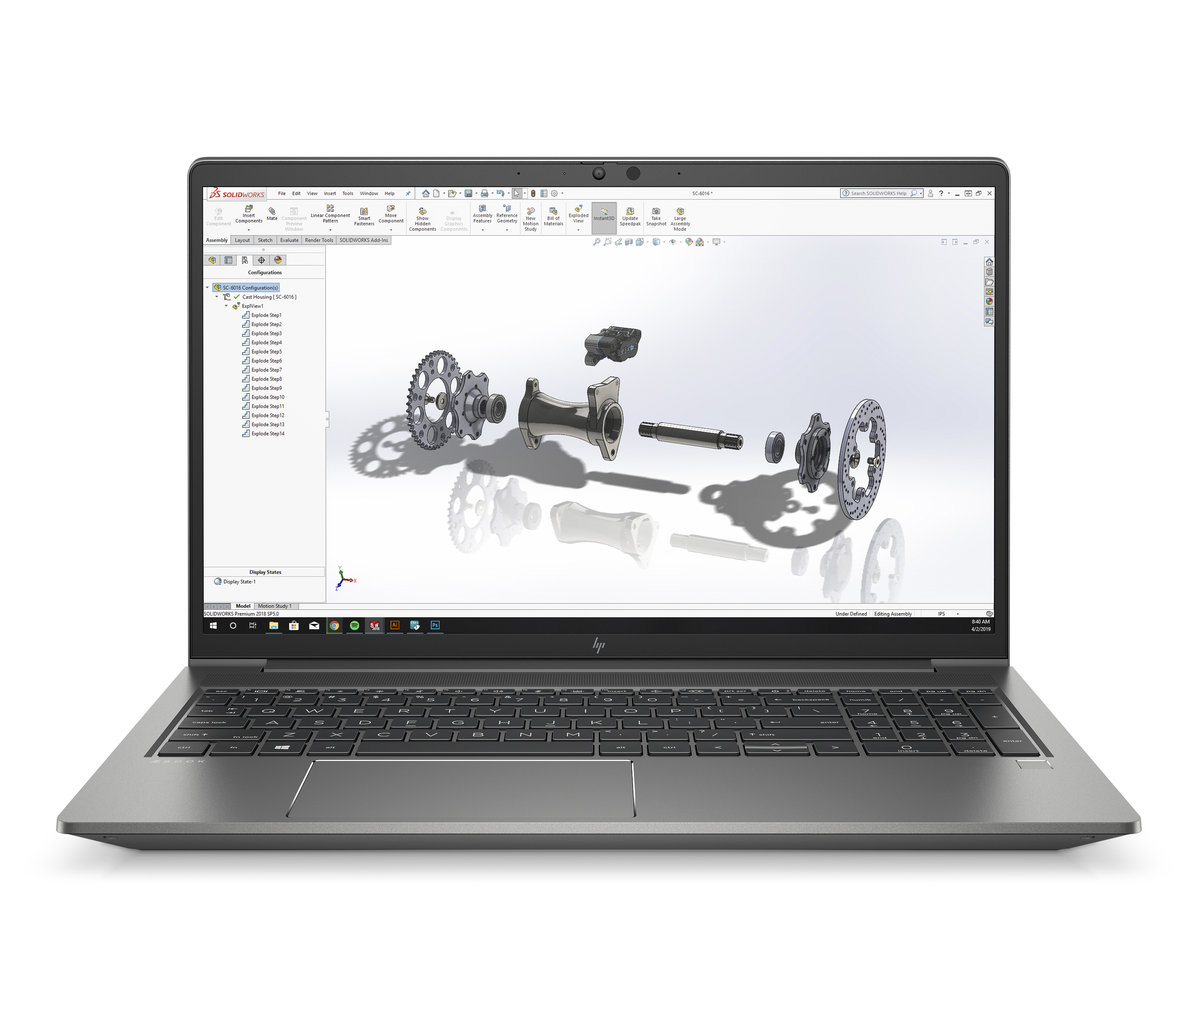 HP Zbook Power G8 15,6'' 400nts i7-11800H/16GB/512SSD/NVIDIA® Quadro® T600-4GB/W10P - 313S5EA#BCM